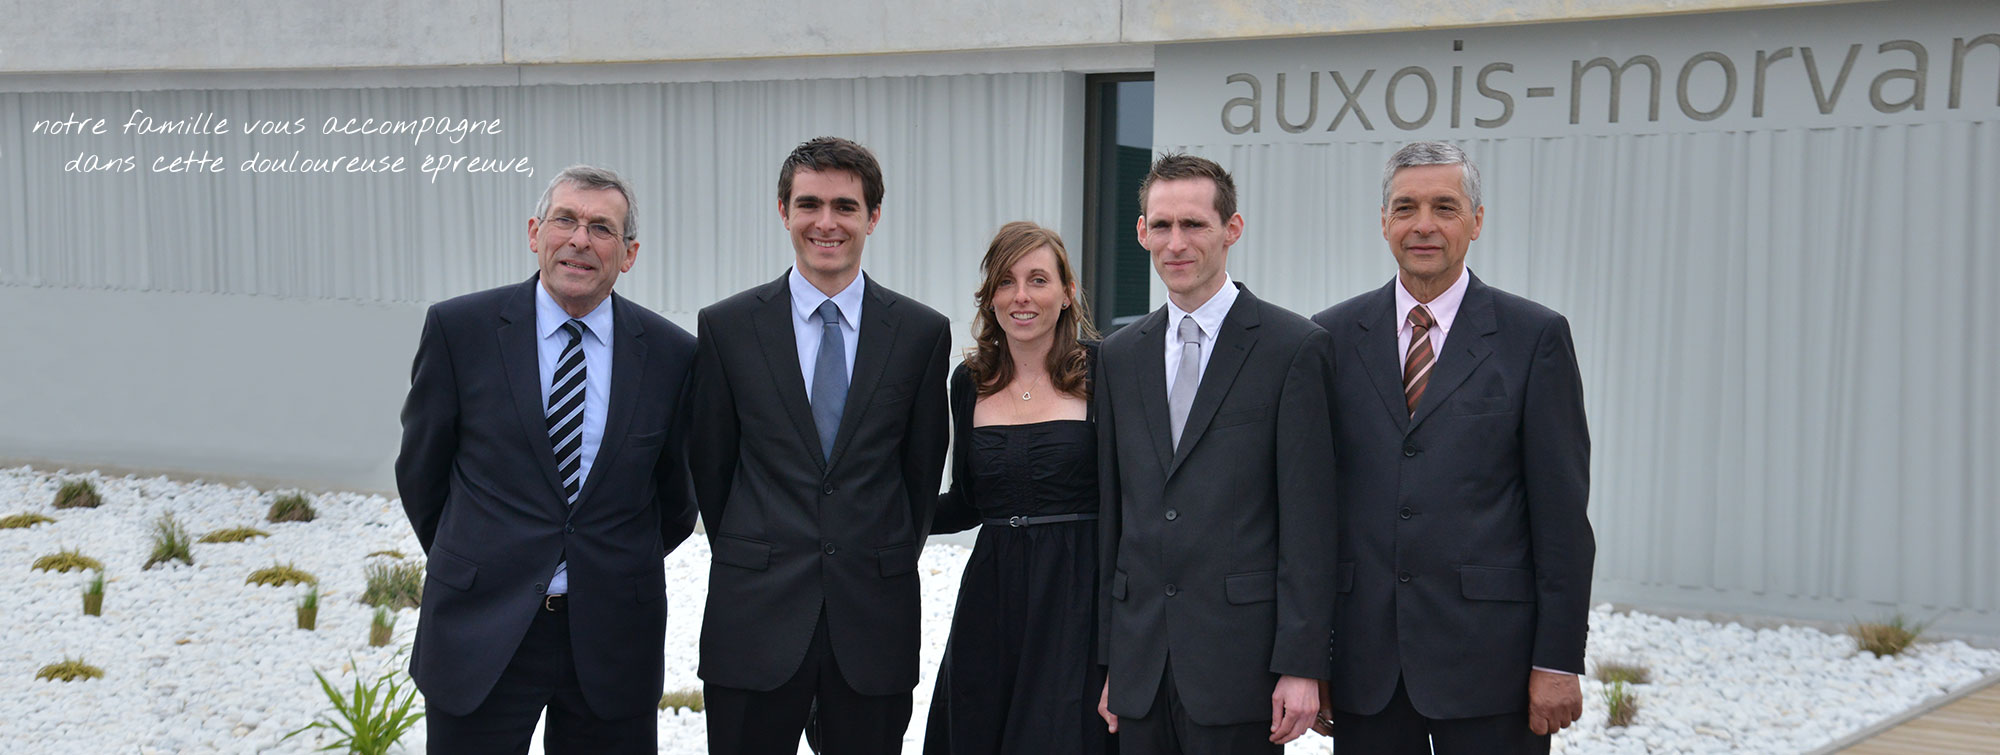 famille-girard-pompes-funebres-girard-semur-en-auxois1